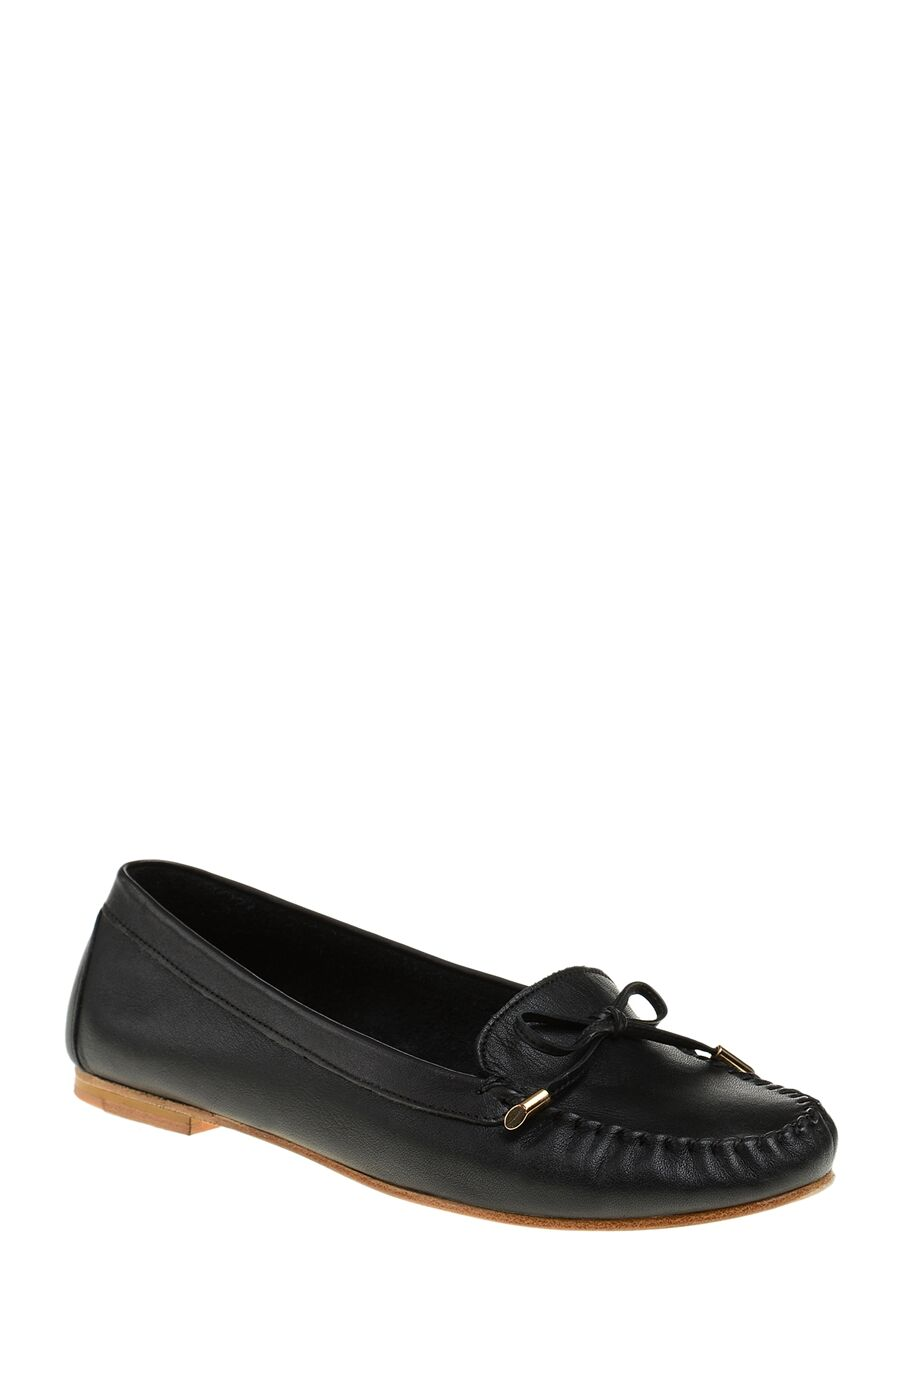 Dıvarese Siyah Loafer – 149.0 TL